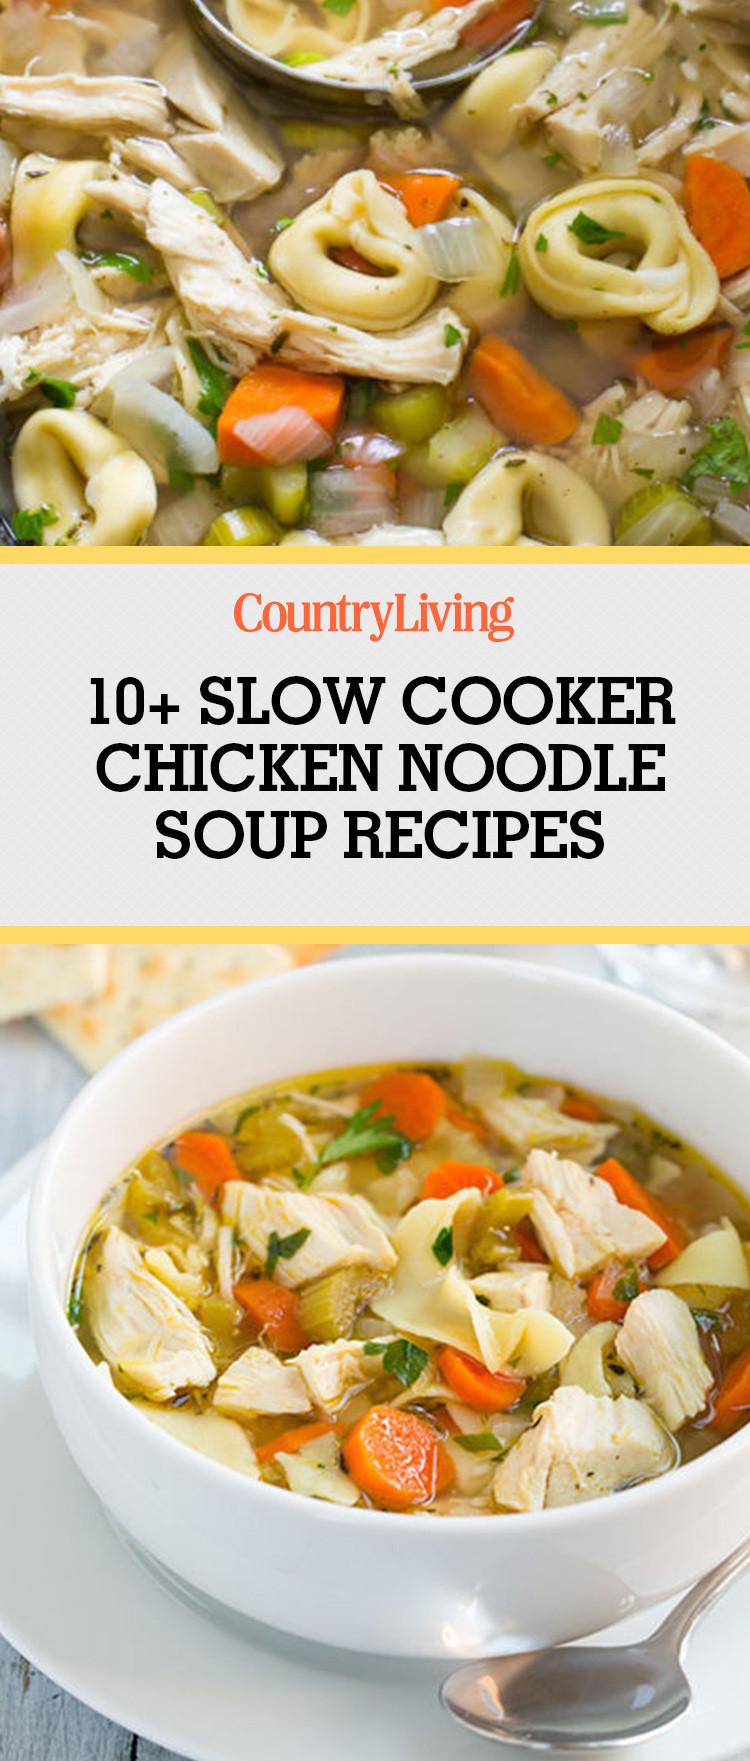 Easy Crockpot Chicken Noodle Soup  11 Easy Crock Pot Chicken Noodle Soup Recipes Best Slow